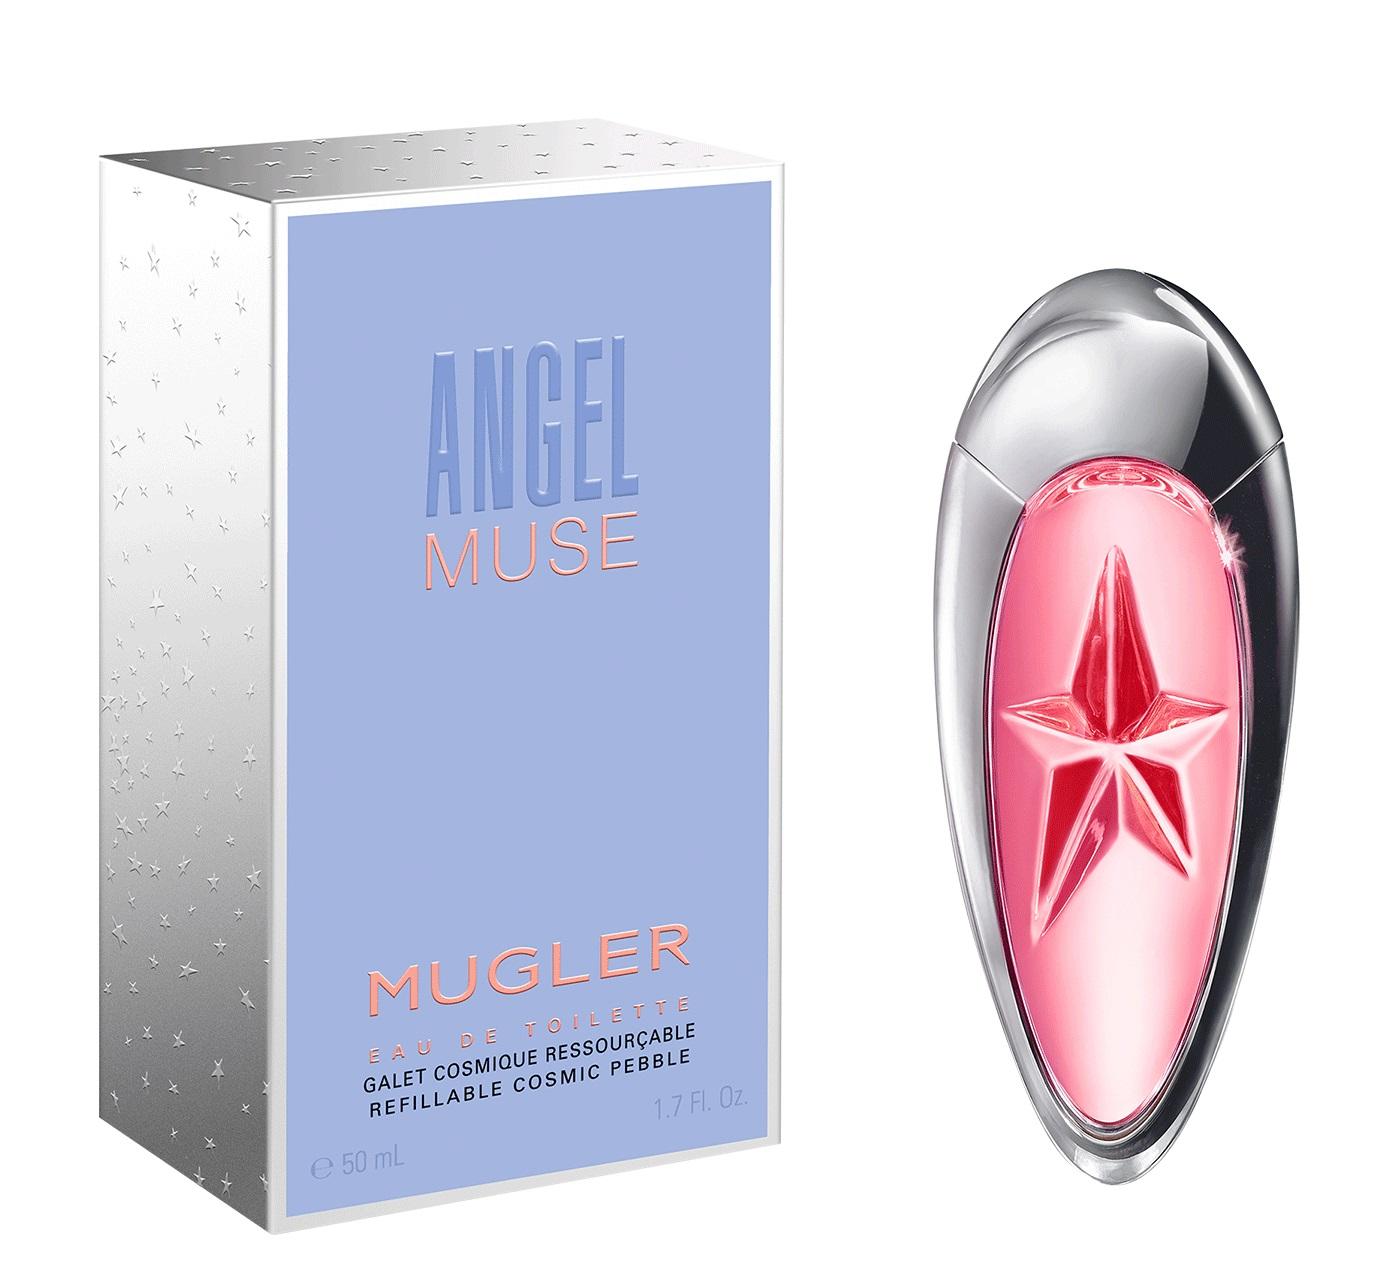 b9017c8f4 Thierry Mugler Angel Muse Eau de Toilette العطر الجديد من تيري موغلر ...